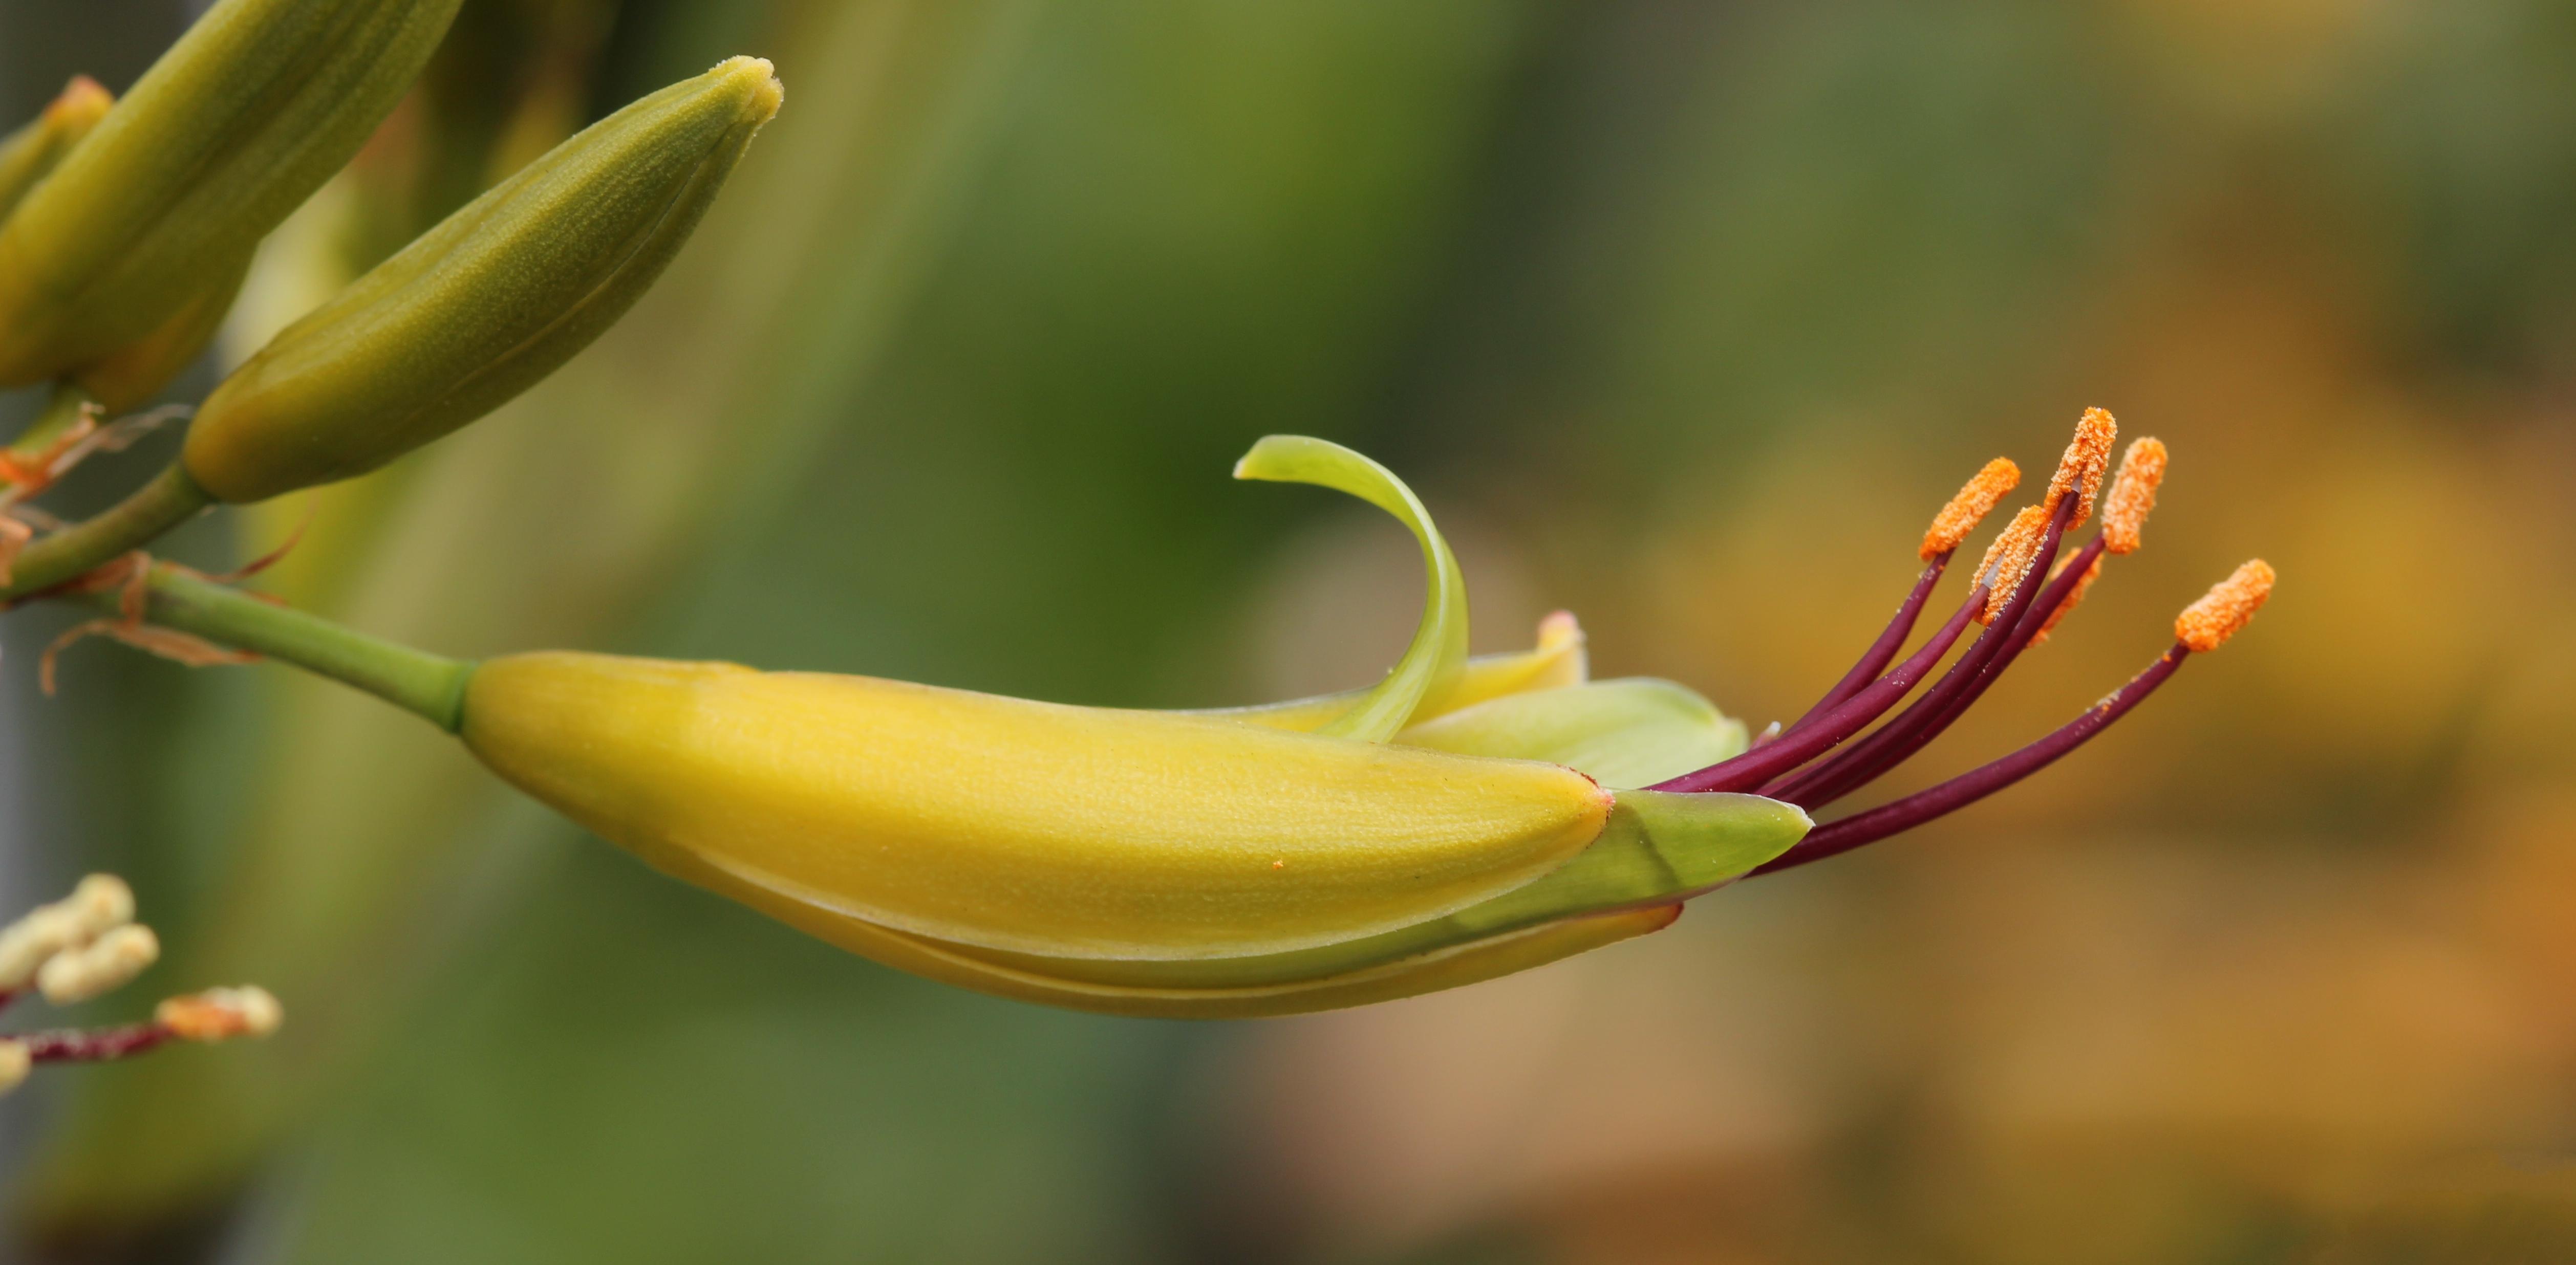 Filemountain flax flower phormium cookianum 2g wikimedia commons filemountain flax flower phormium cookianum 2g mightylinksfo